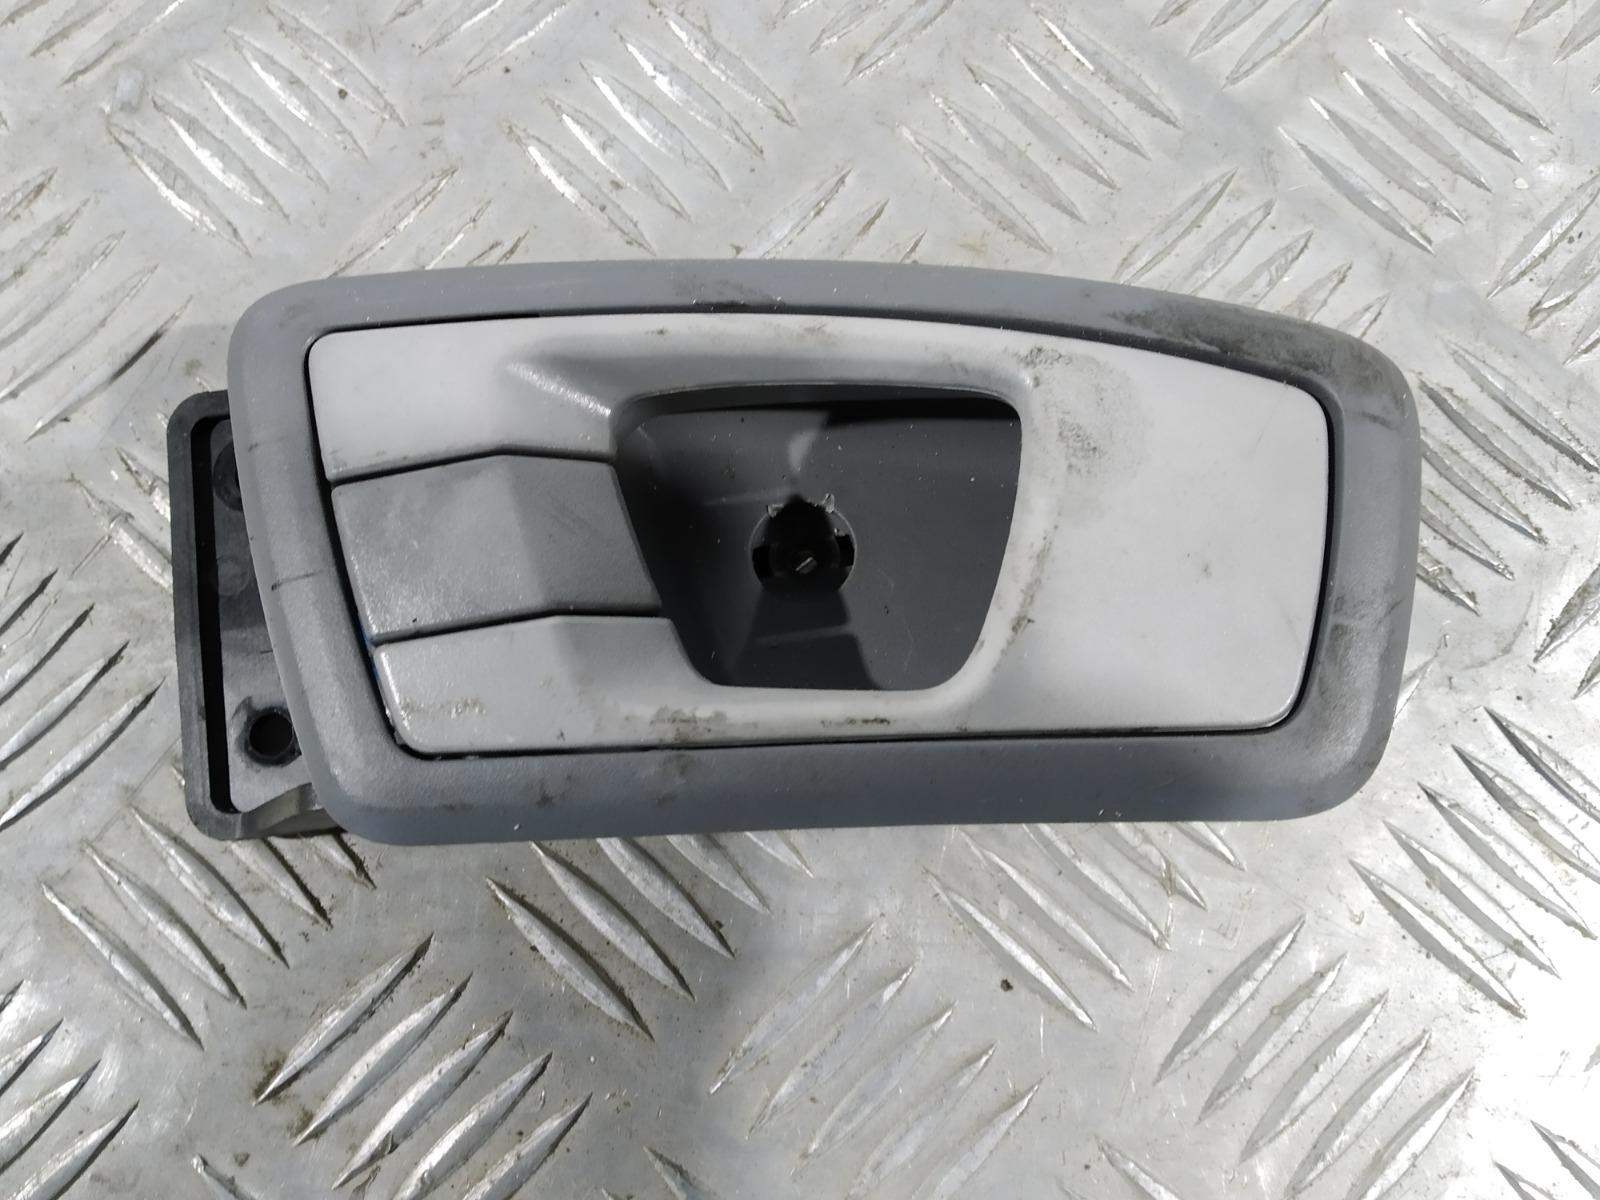 Ручка внутренняя задняя левая Kia Carens 2.0 CRDI 2005 (б/у)